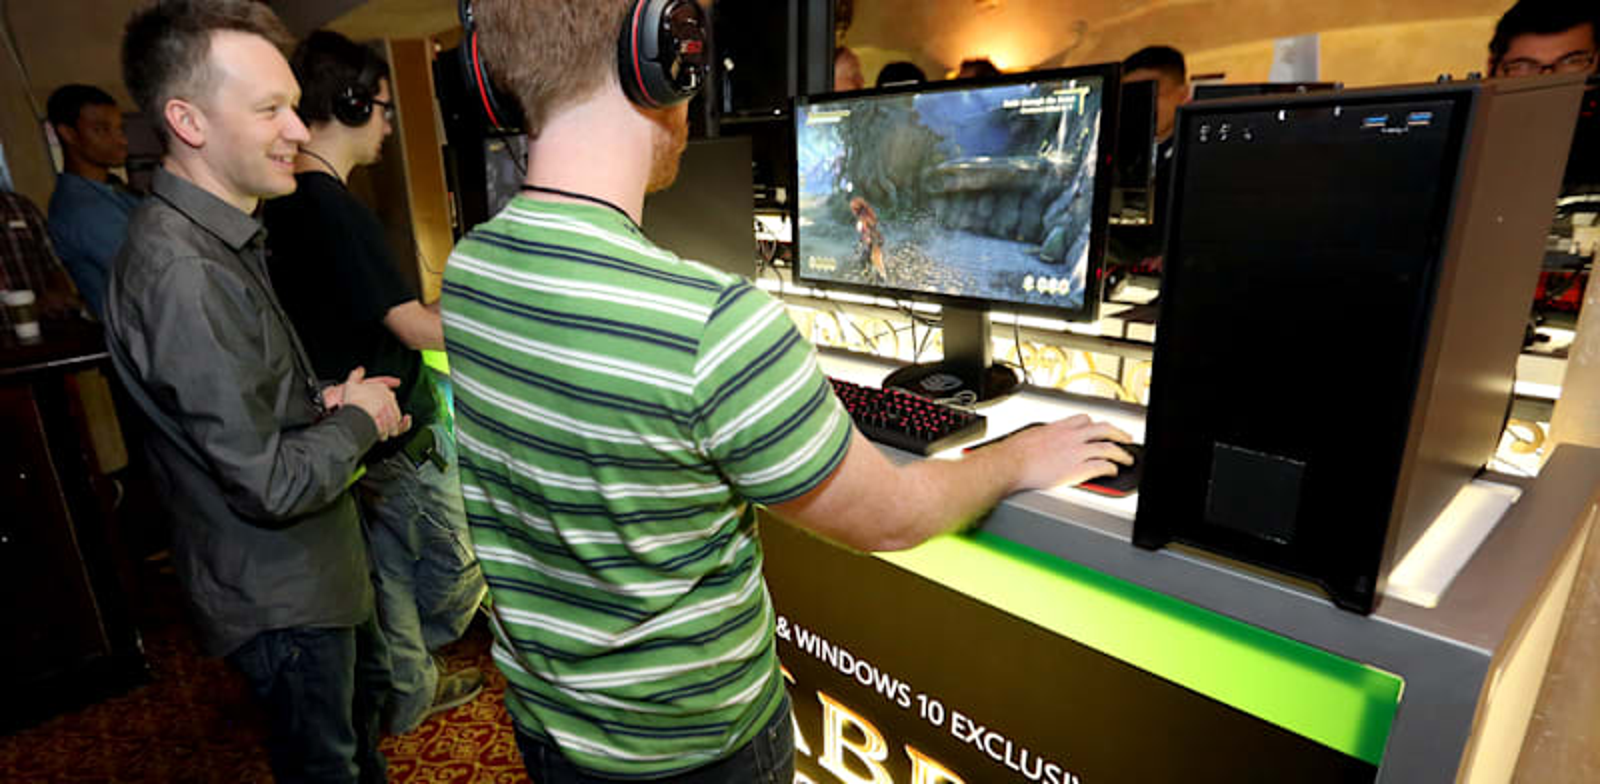 תערוכת הגיימינג E3 / צילום: Associated Press, Casey Rodgers/Invision for Microsoft